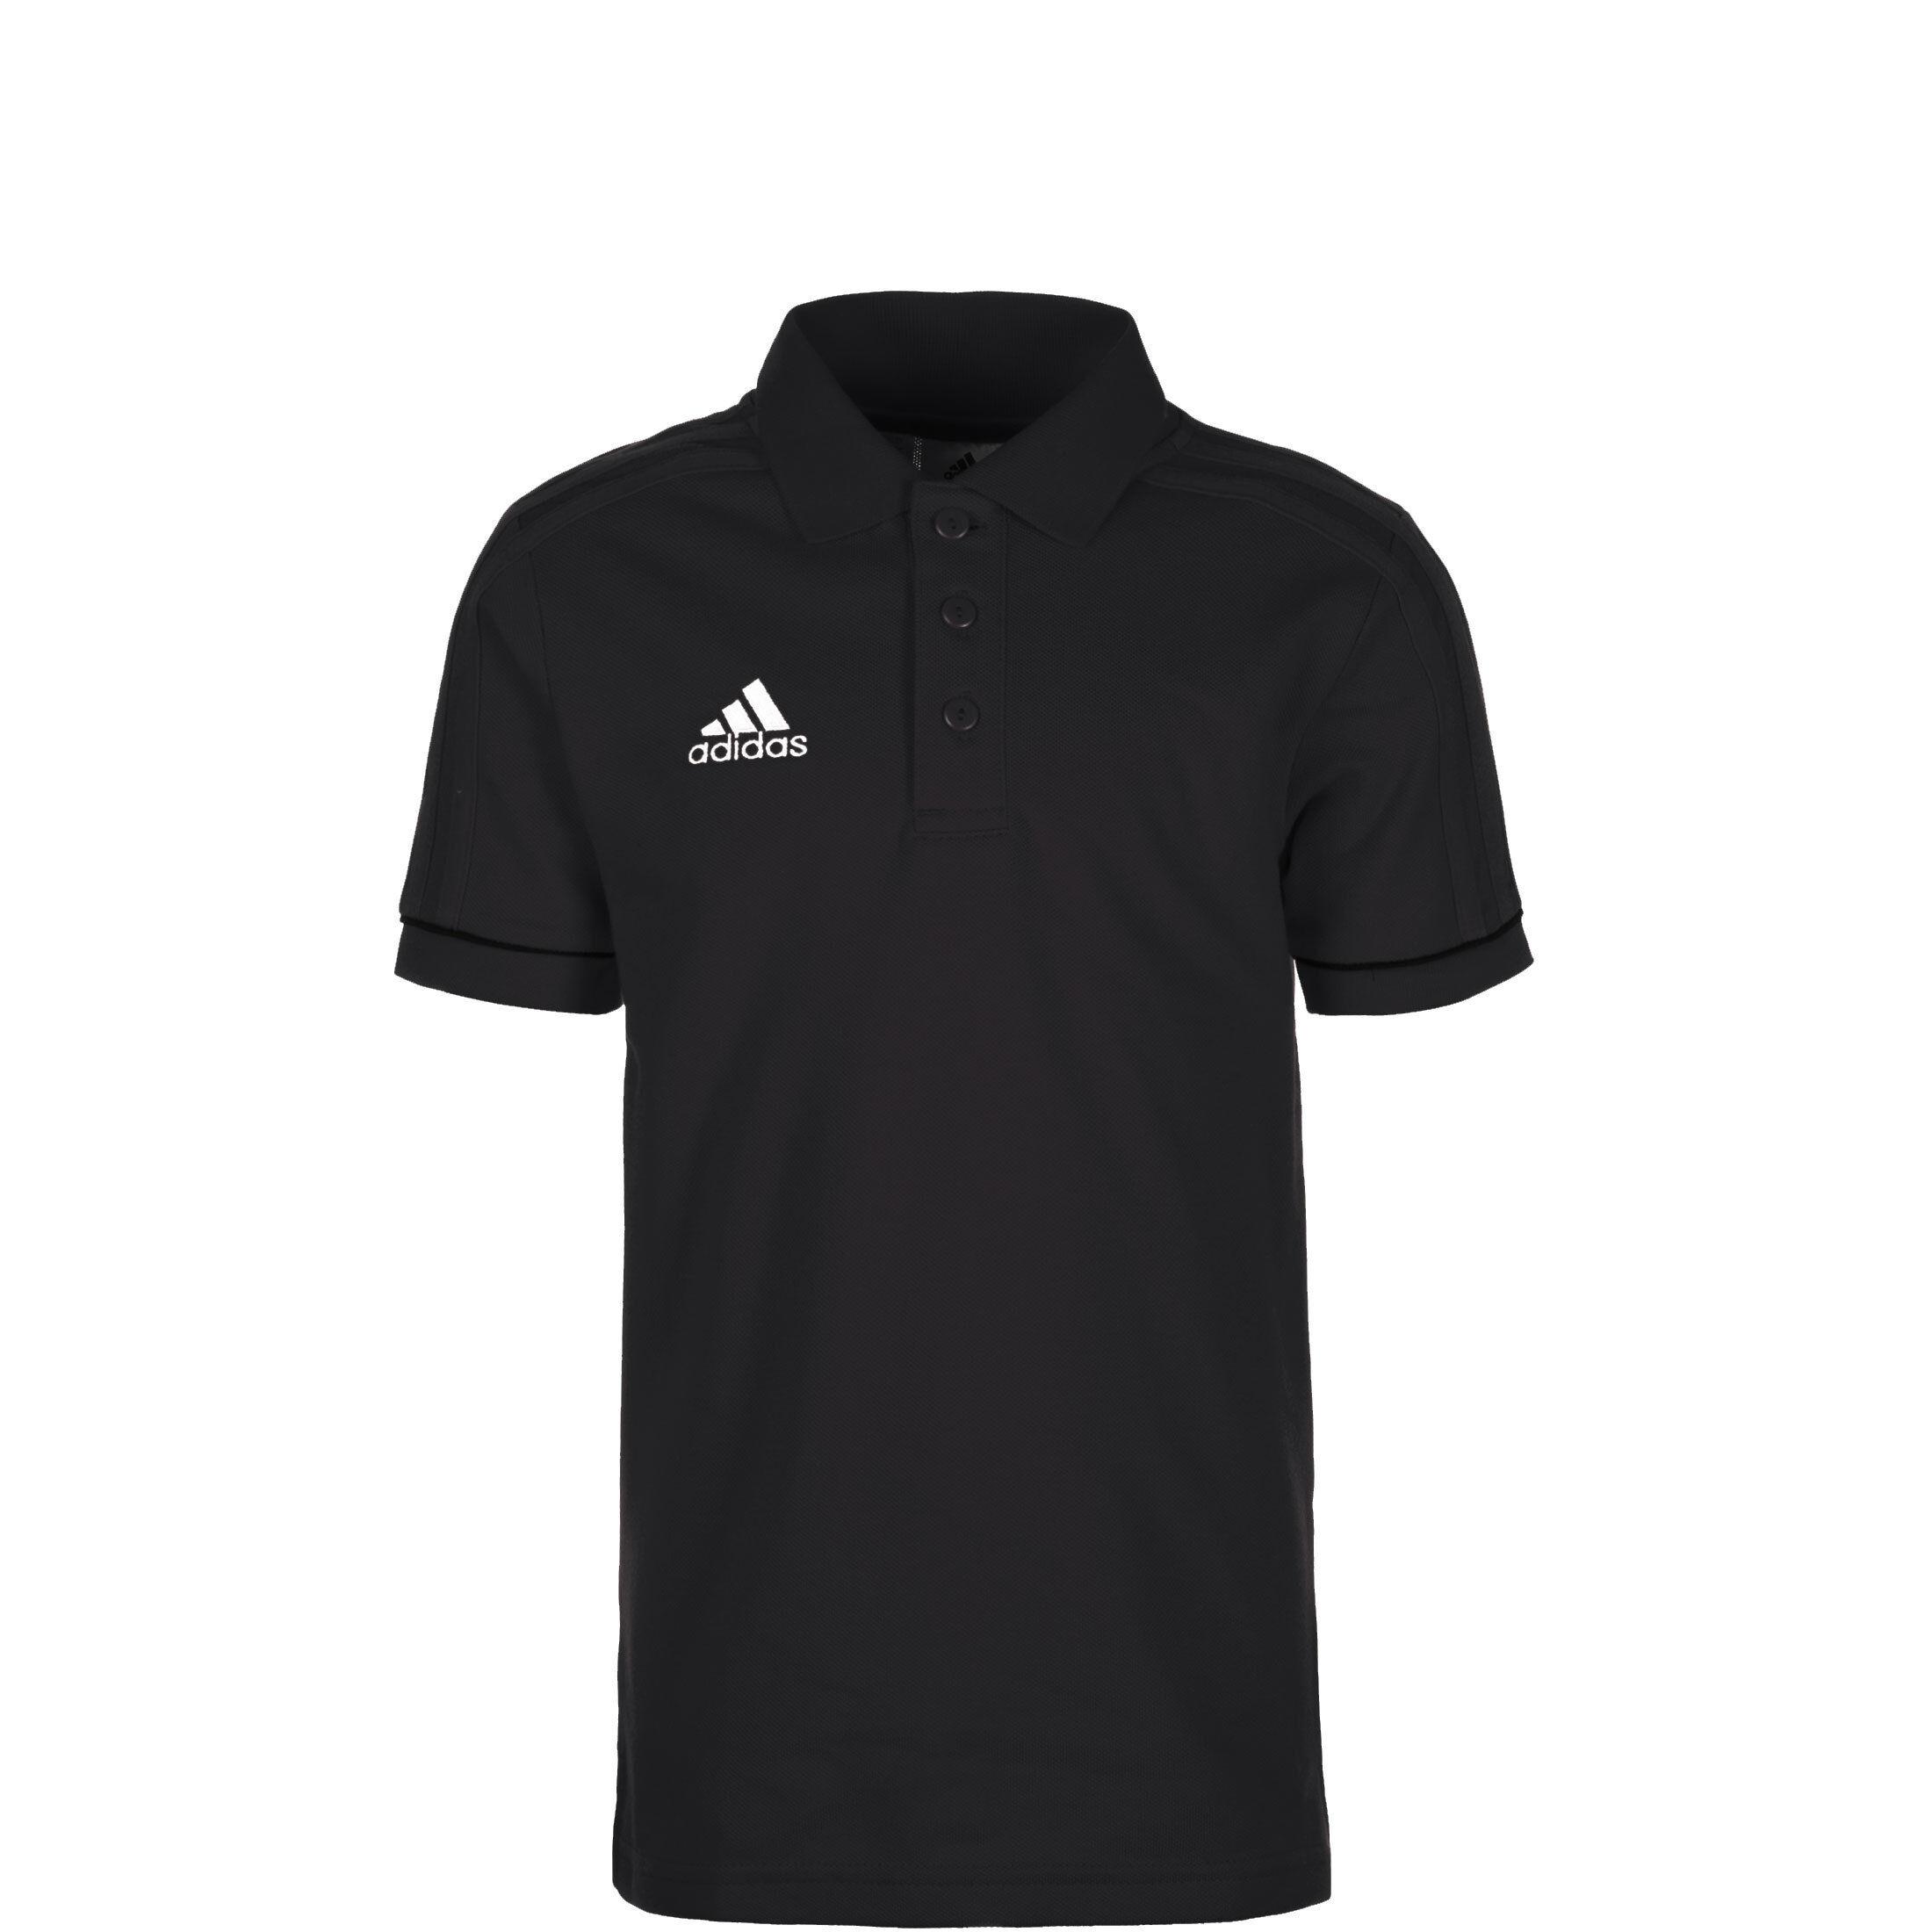 adidas Performance Tiro 17 Poloshirt Kinder weiß schwarz